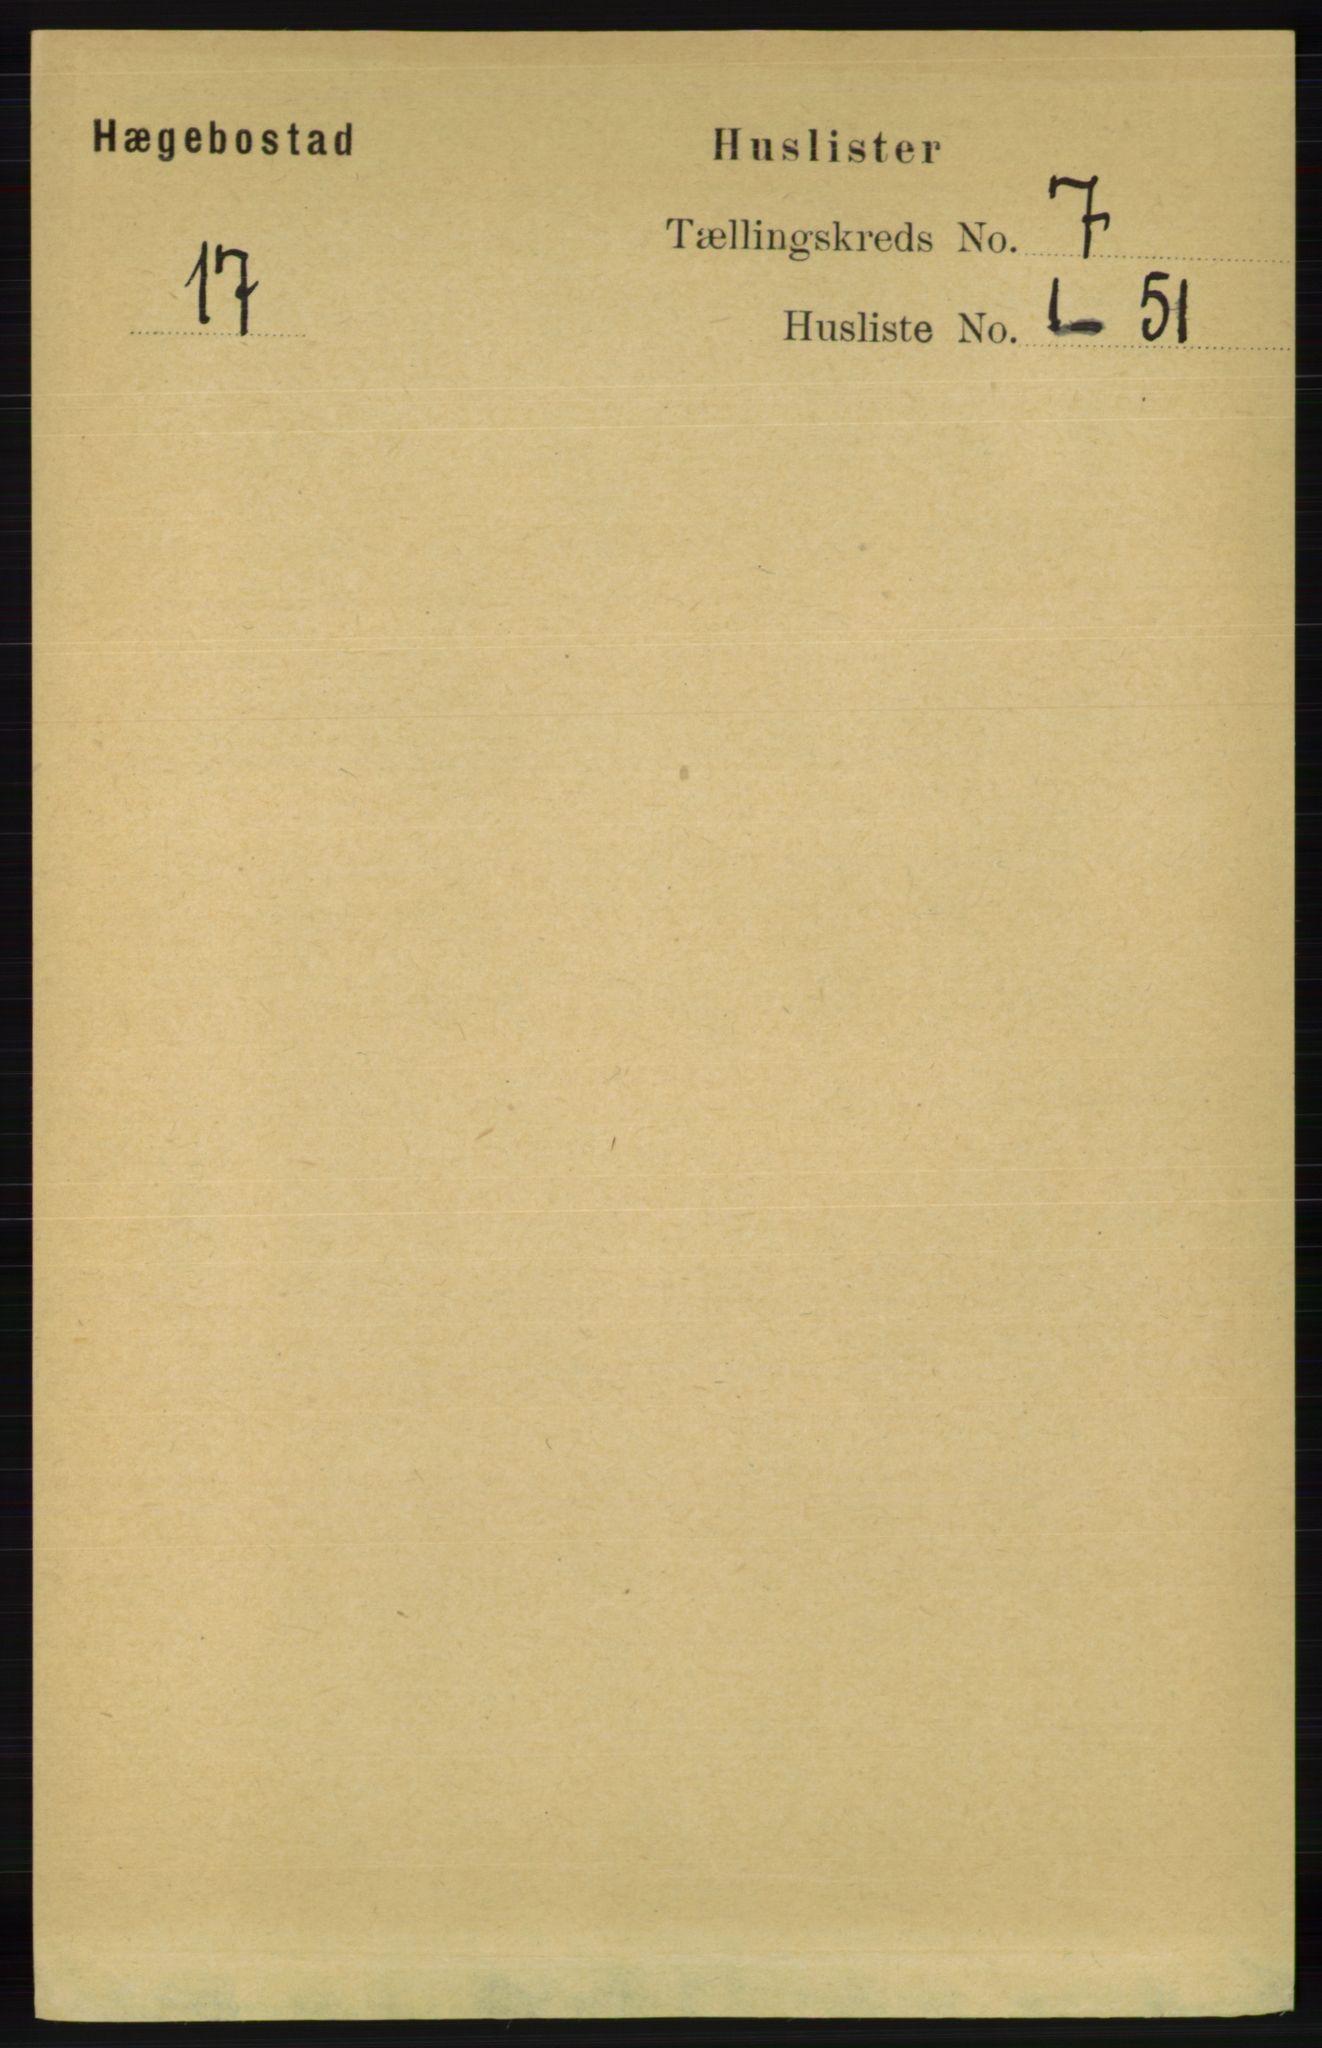 RA, Folketelling 1891 for 1034 Hægebostad herred, 1891, s. 2047